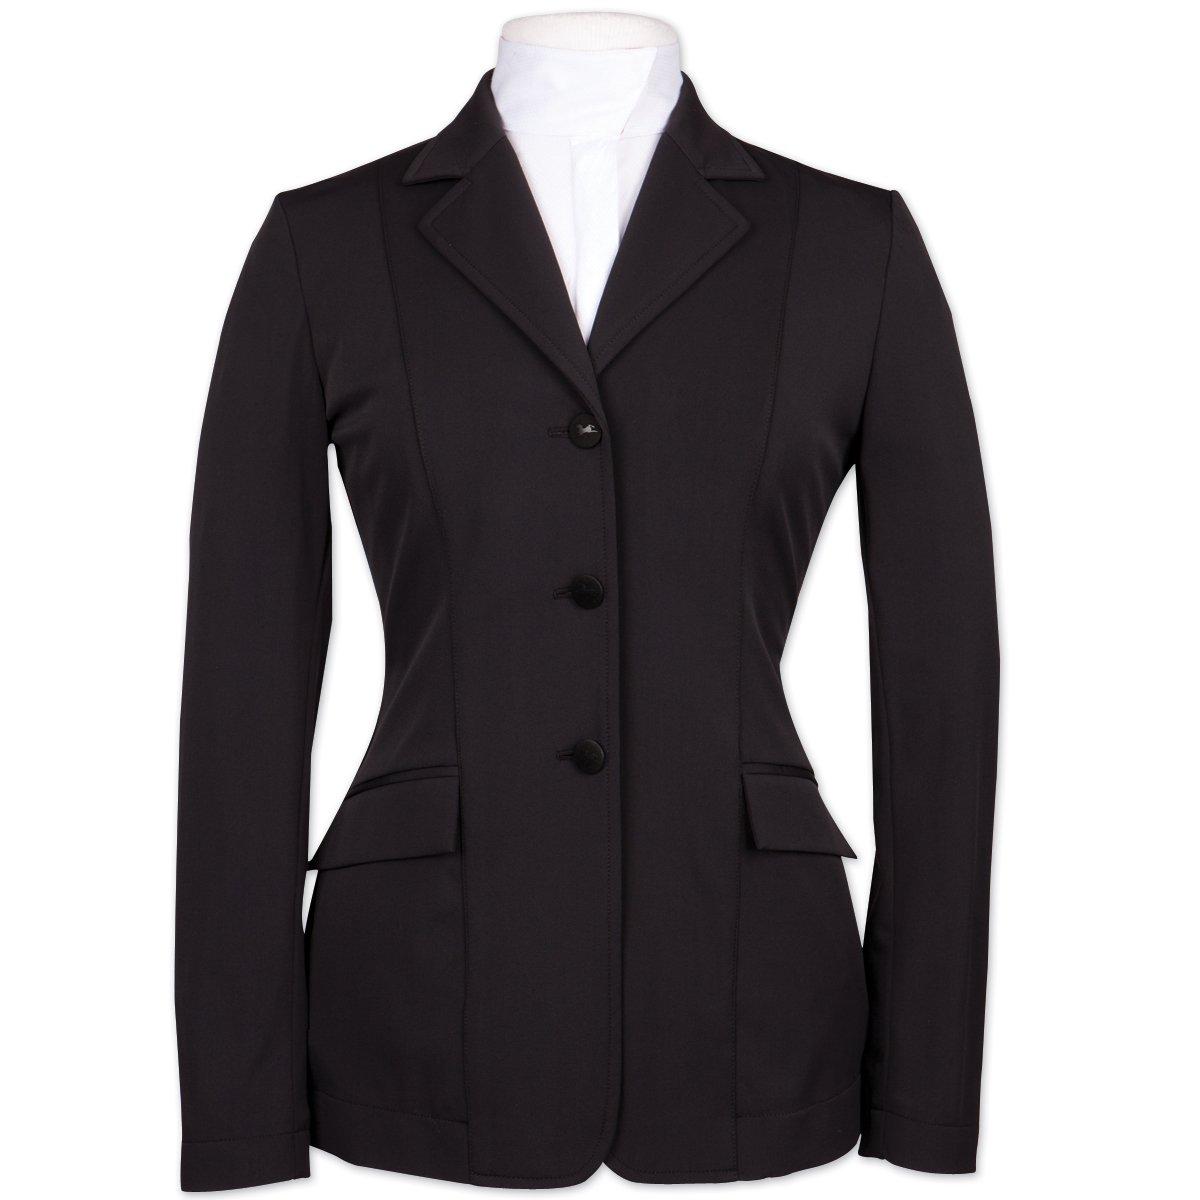 Image of RJ Classics Monterey Ladies Soft Shell Show Coat Blazers